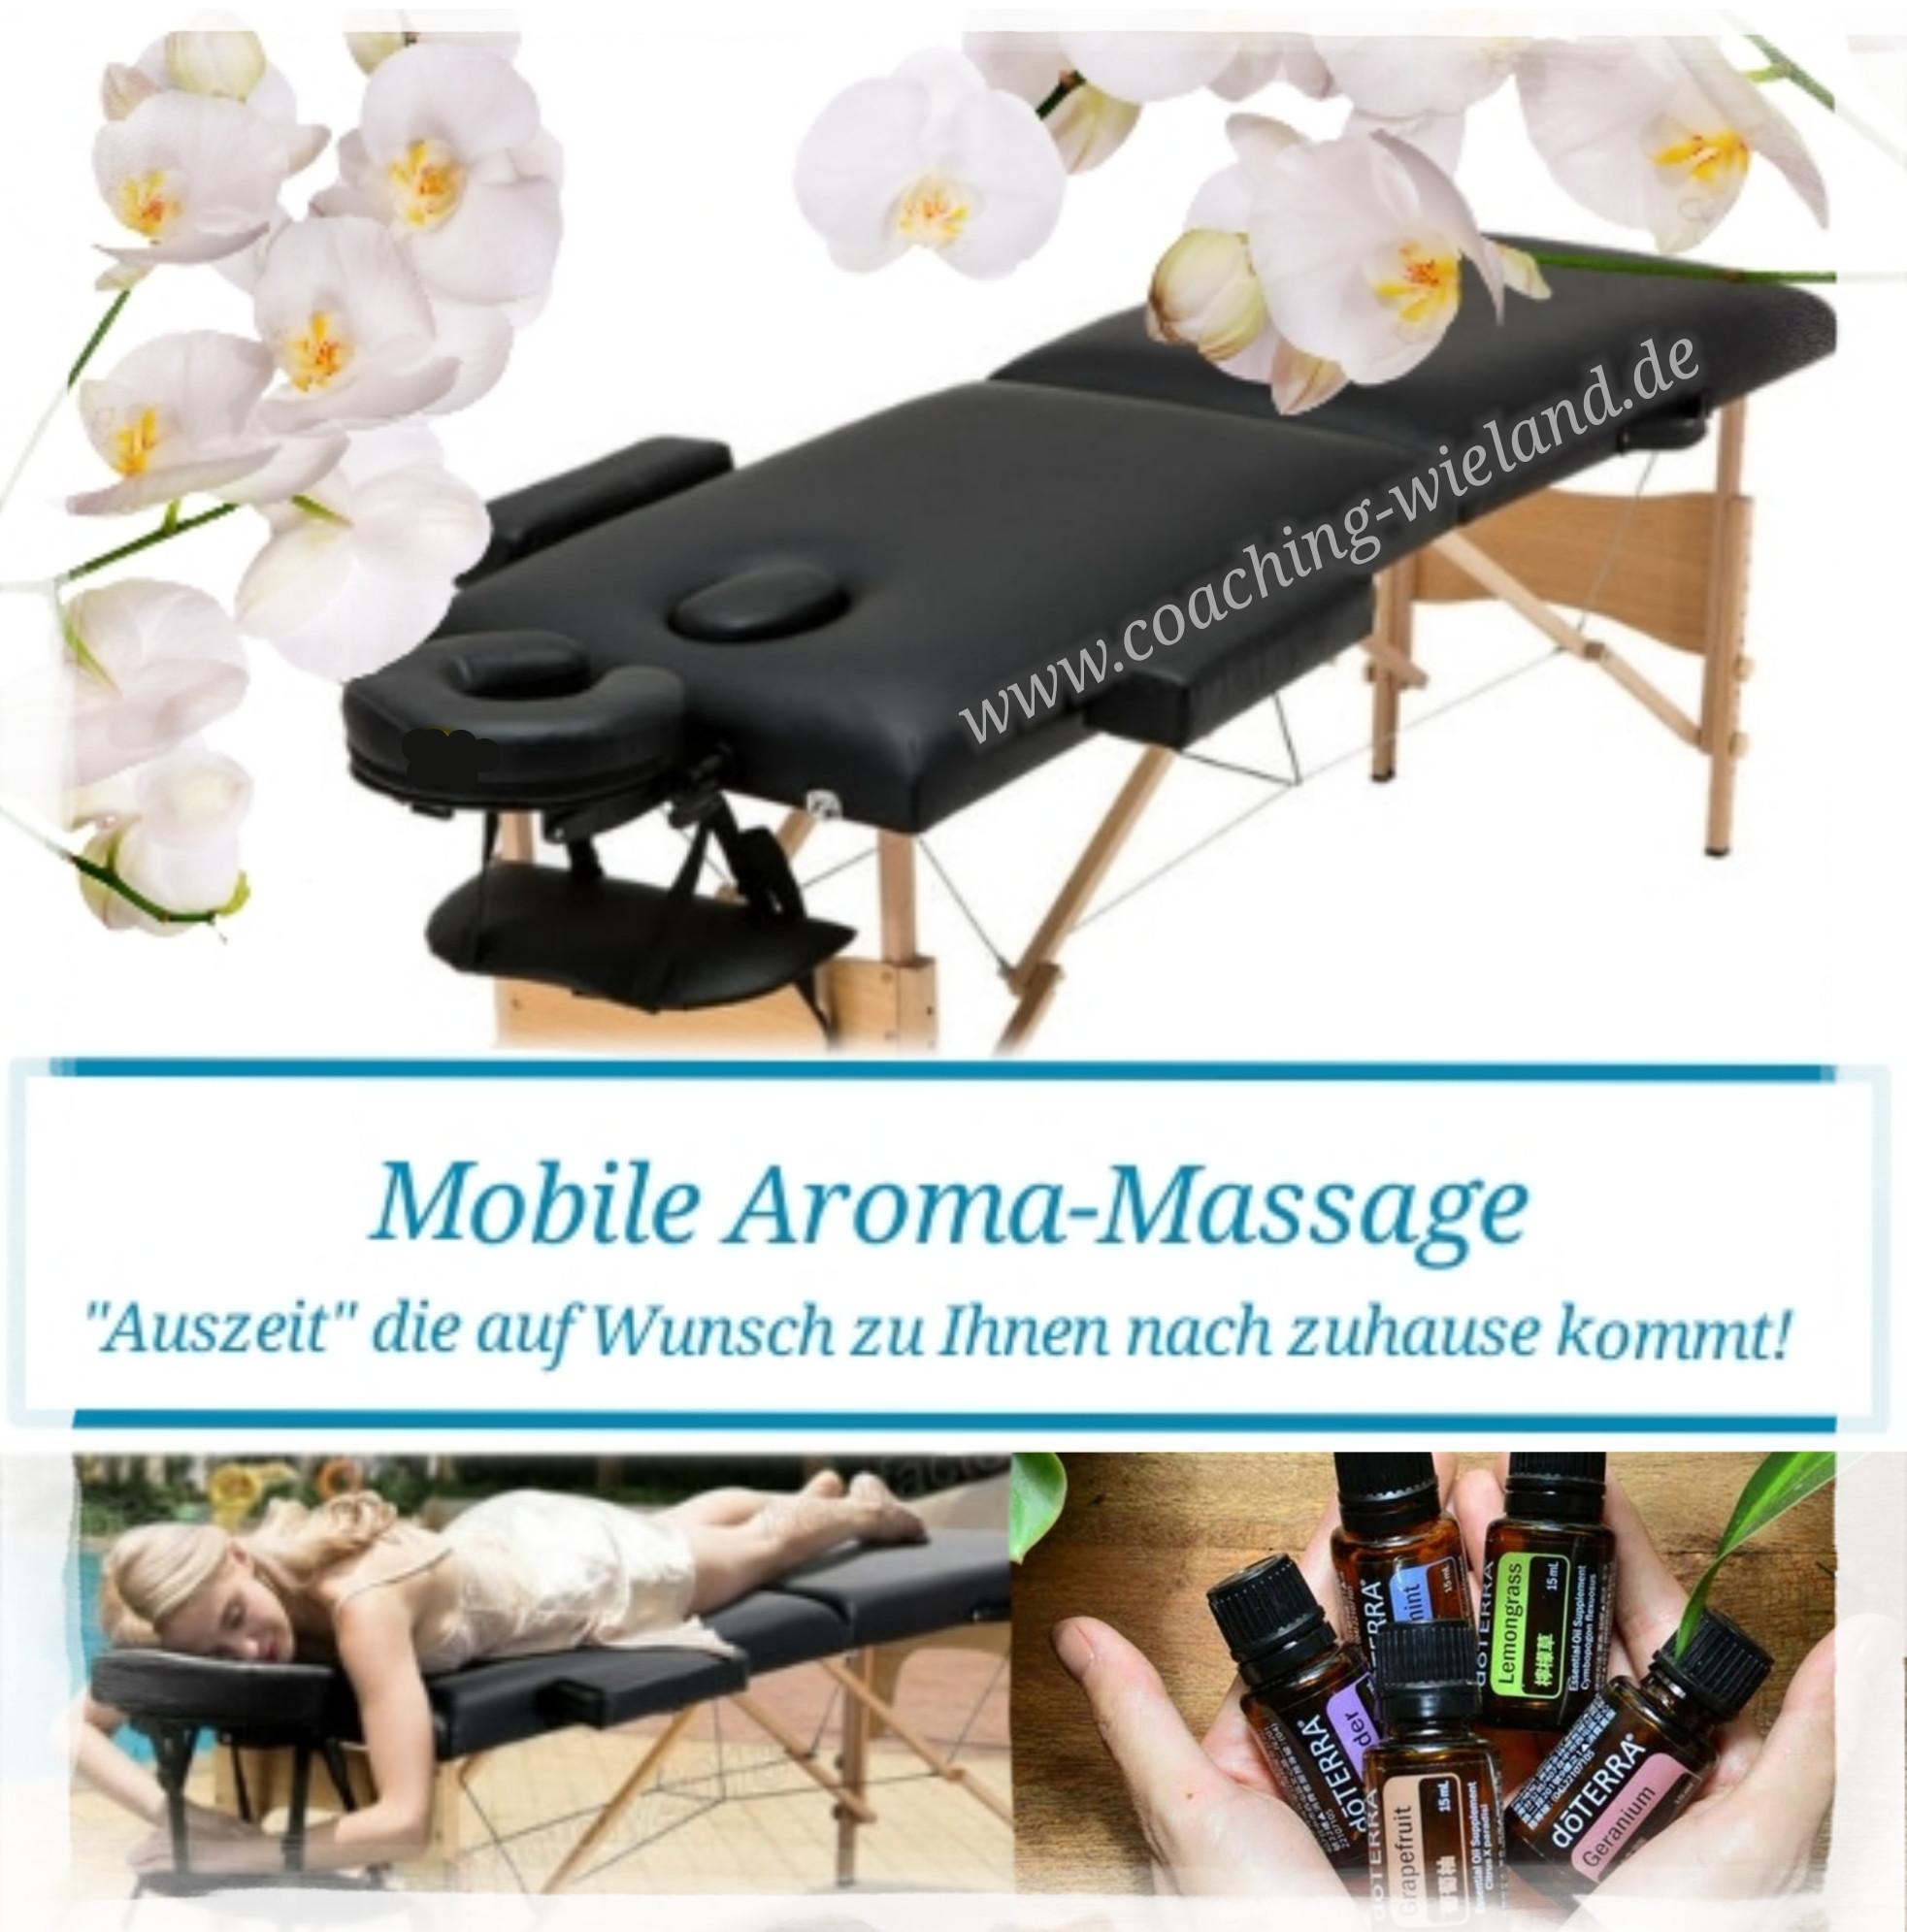 Mobile Aroma-Massage